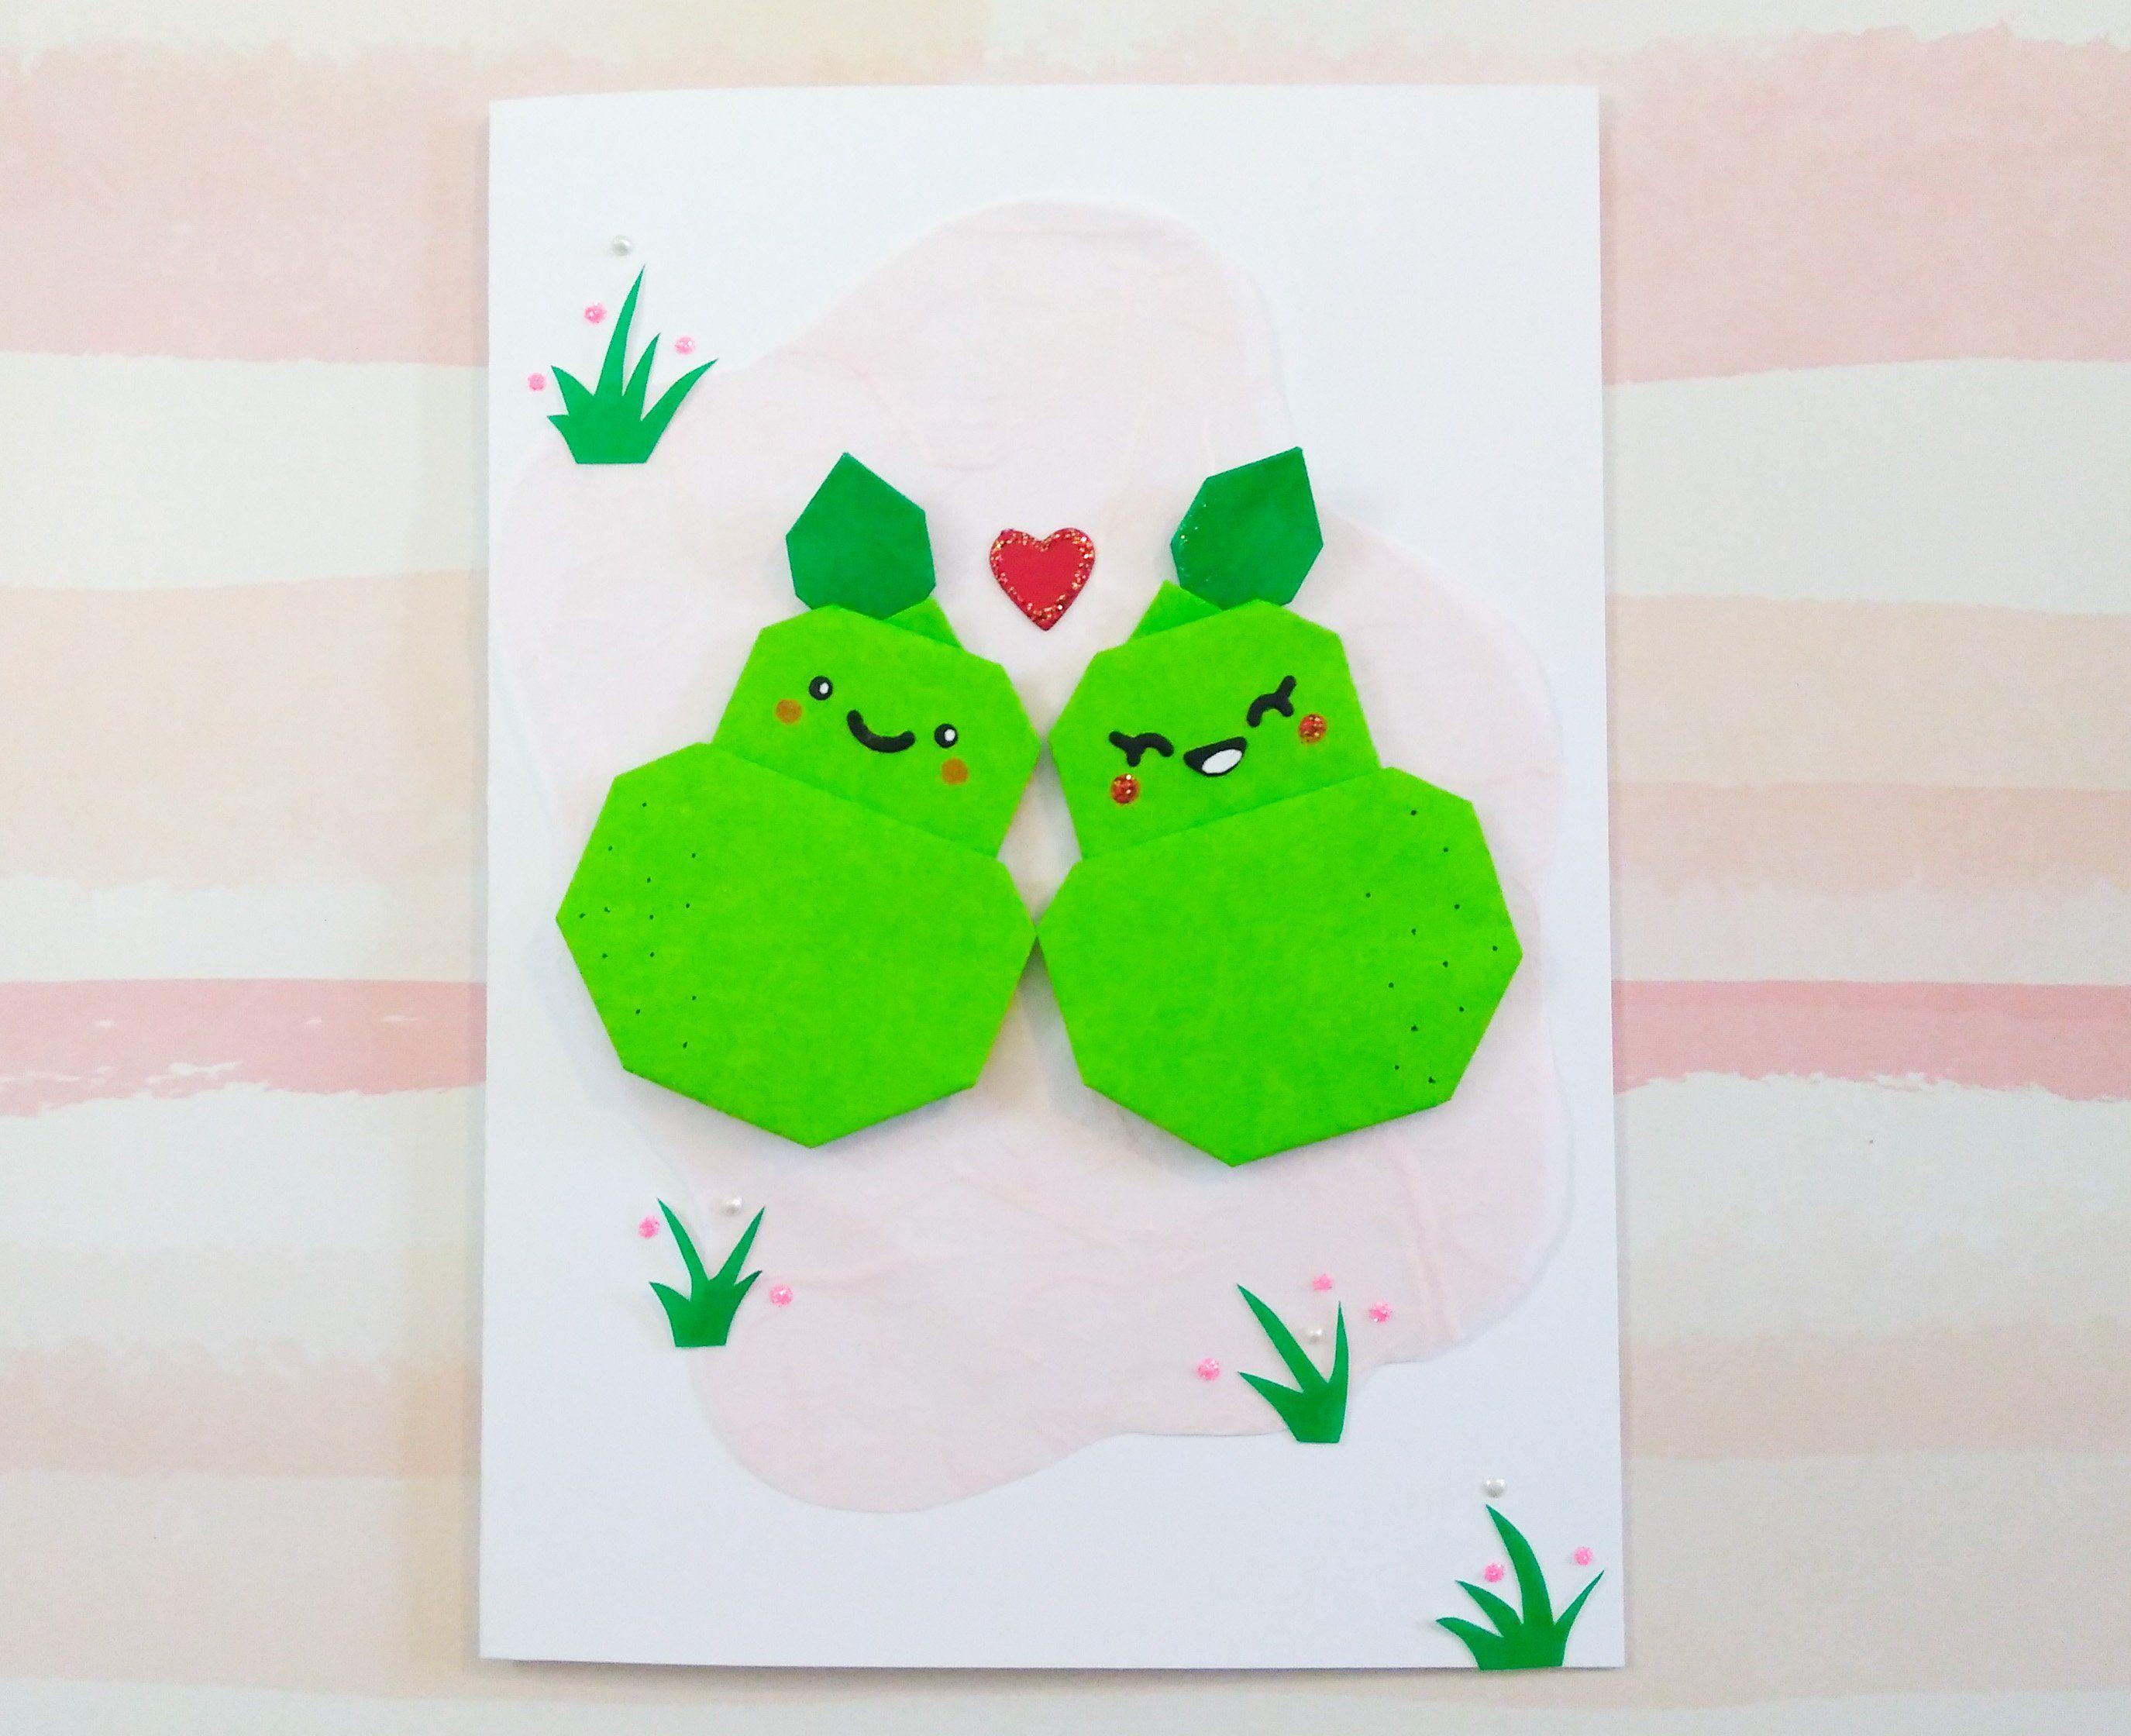 handmade origami pears valentine's day love card